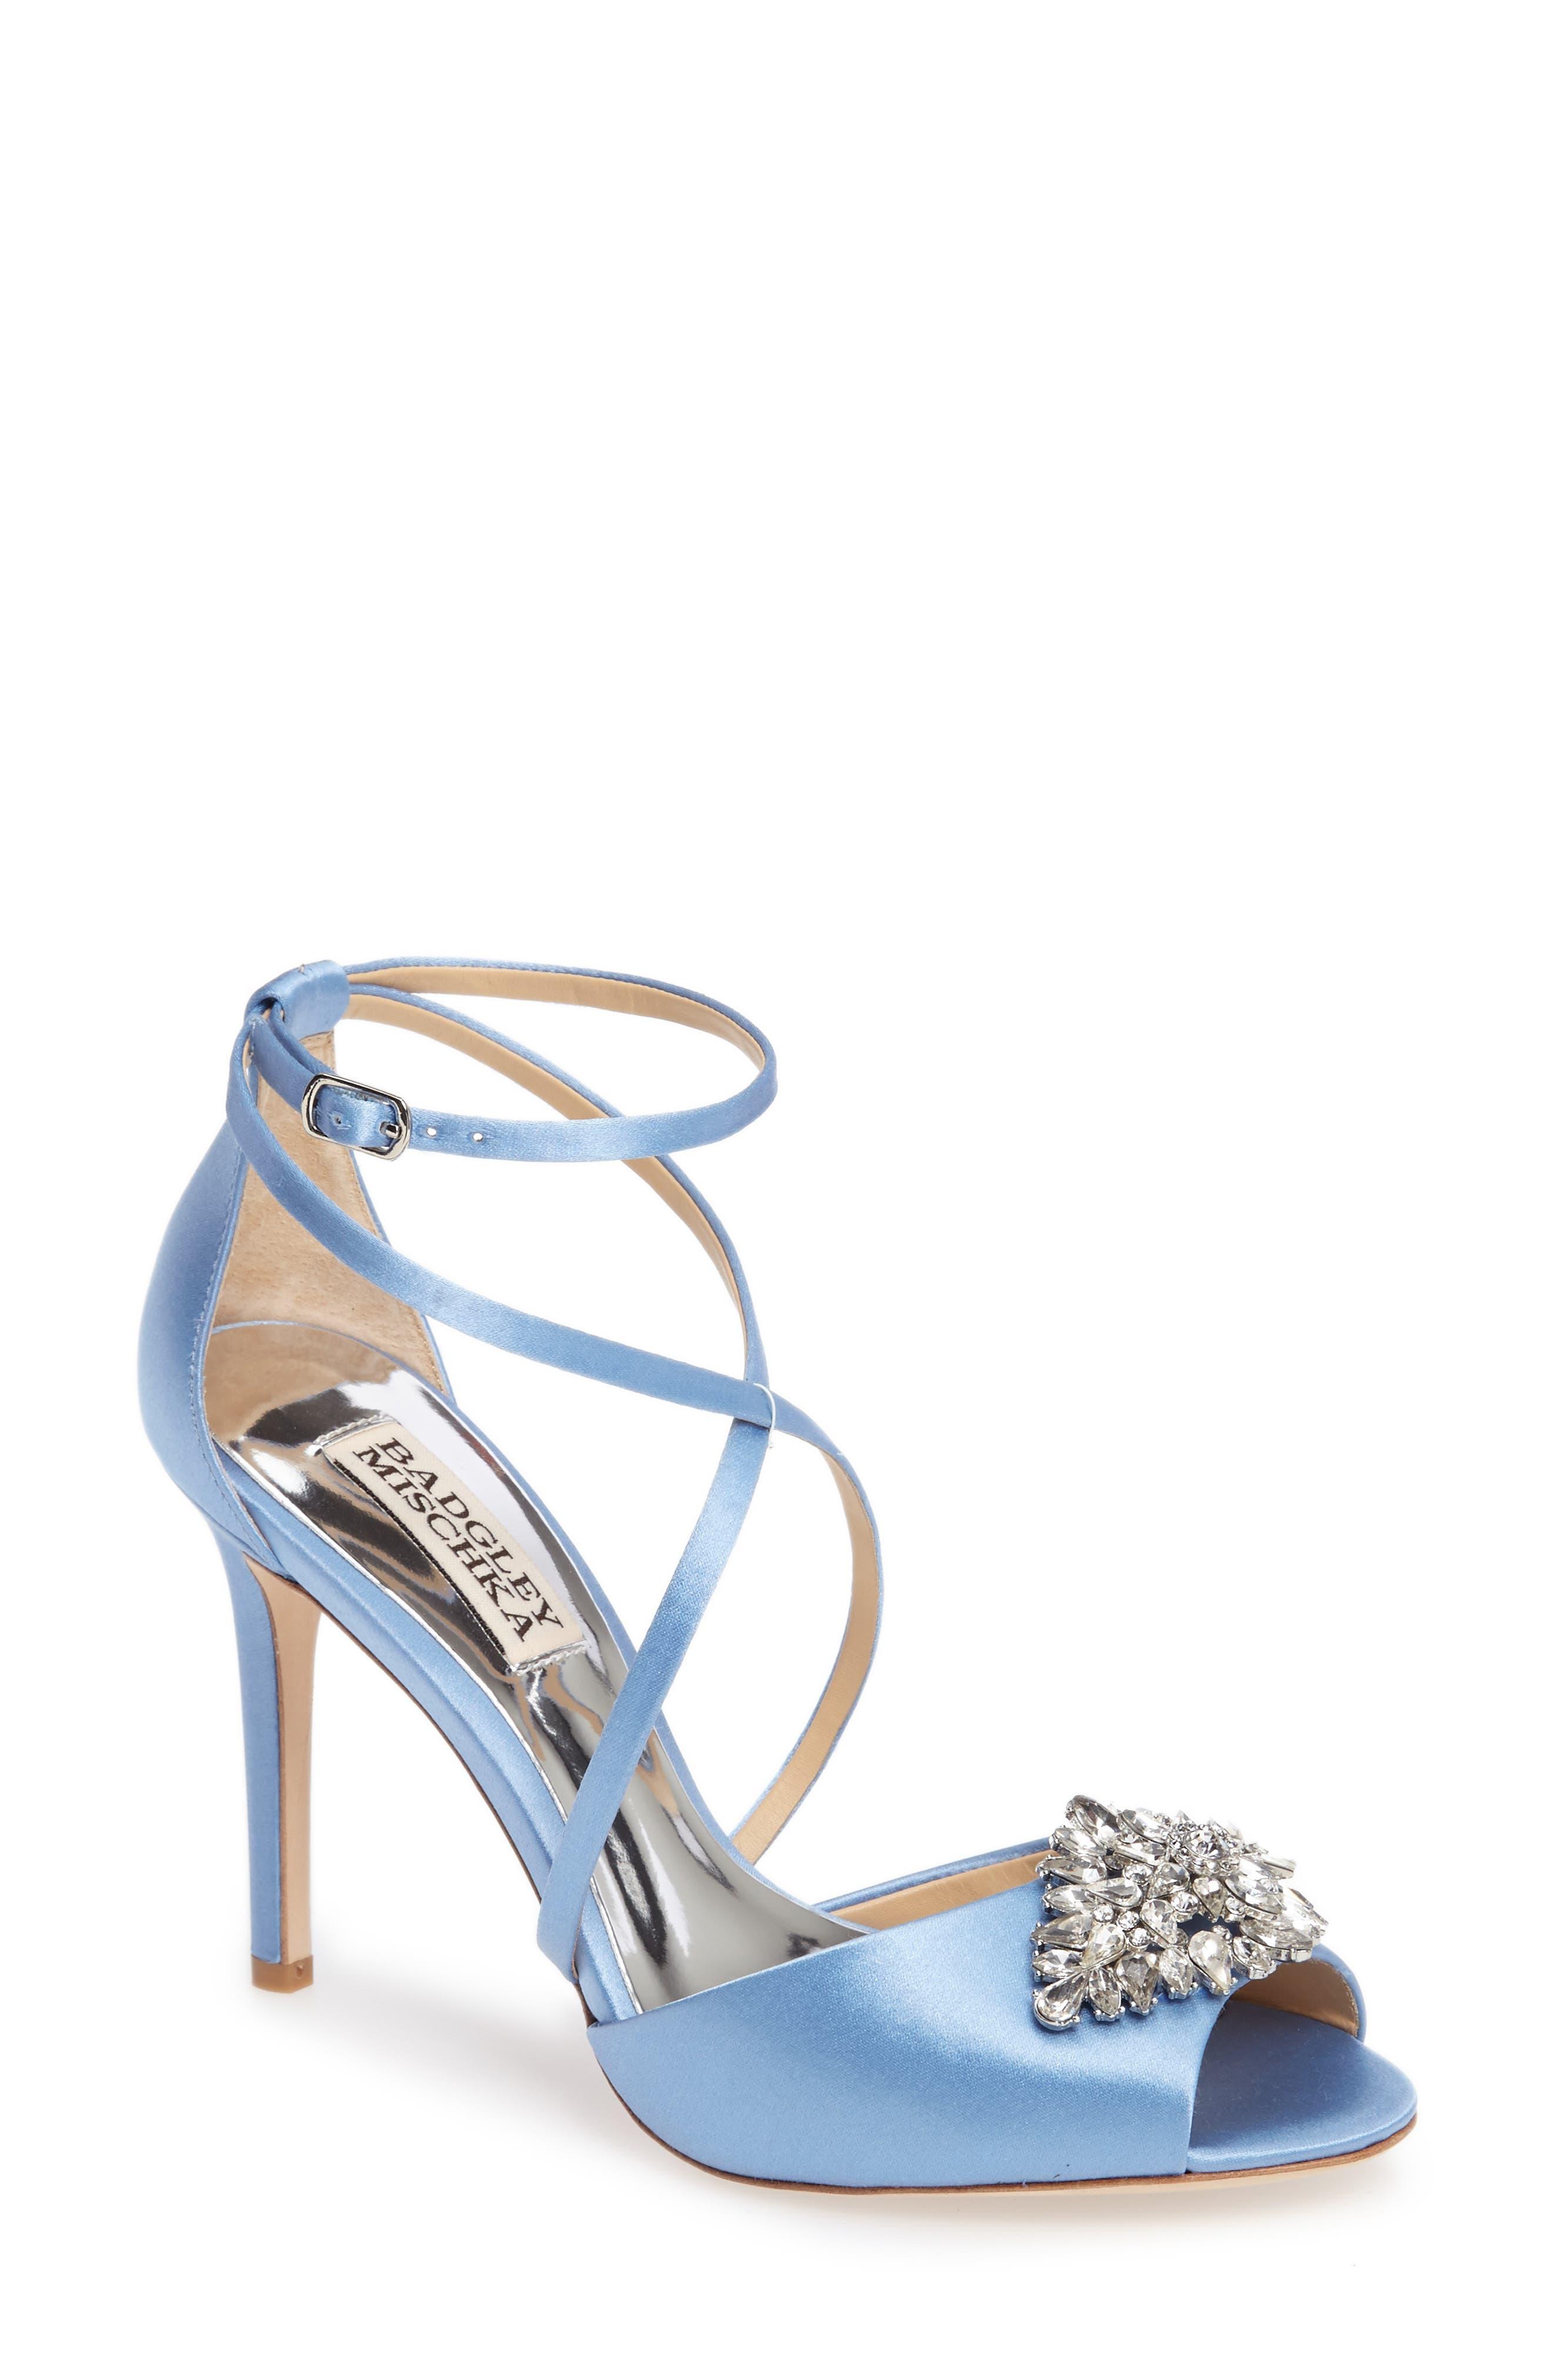 Main Image - Badgley Mischka Tatum Embellished Strappy Sandal (Women)